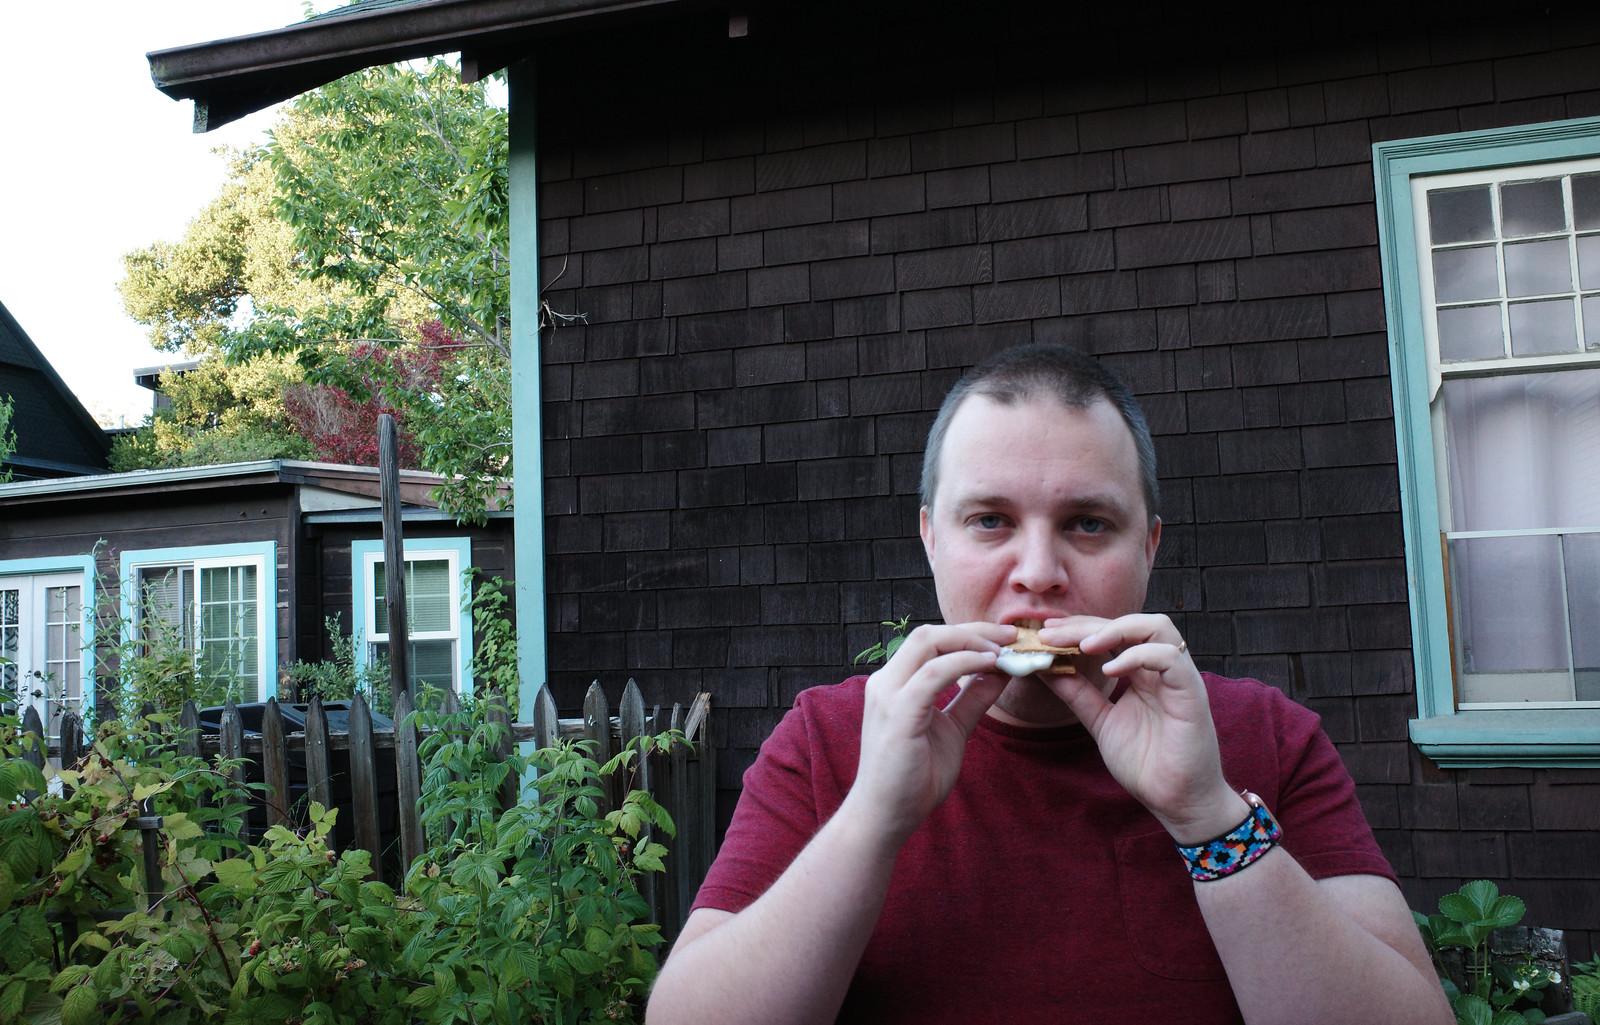 me eating a smore